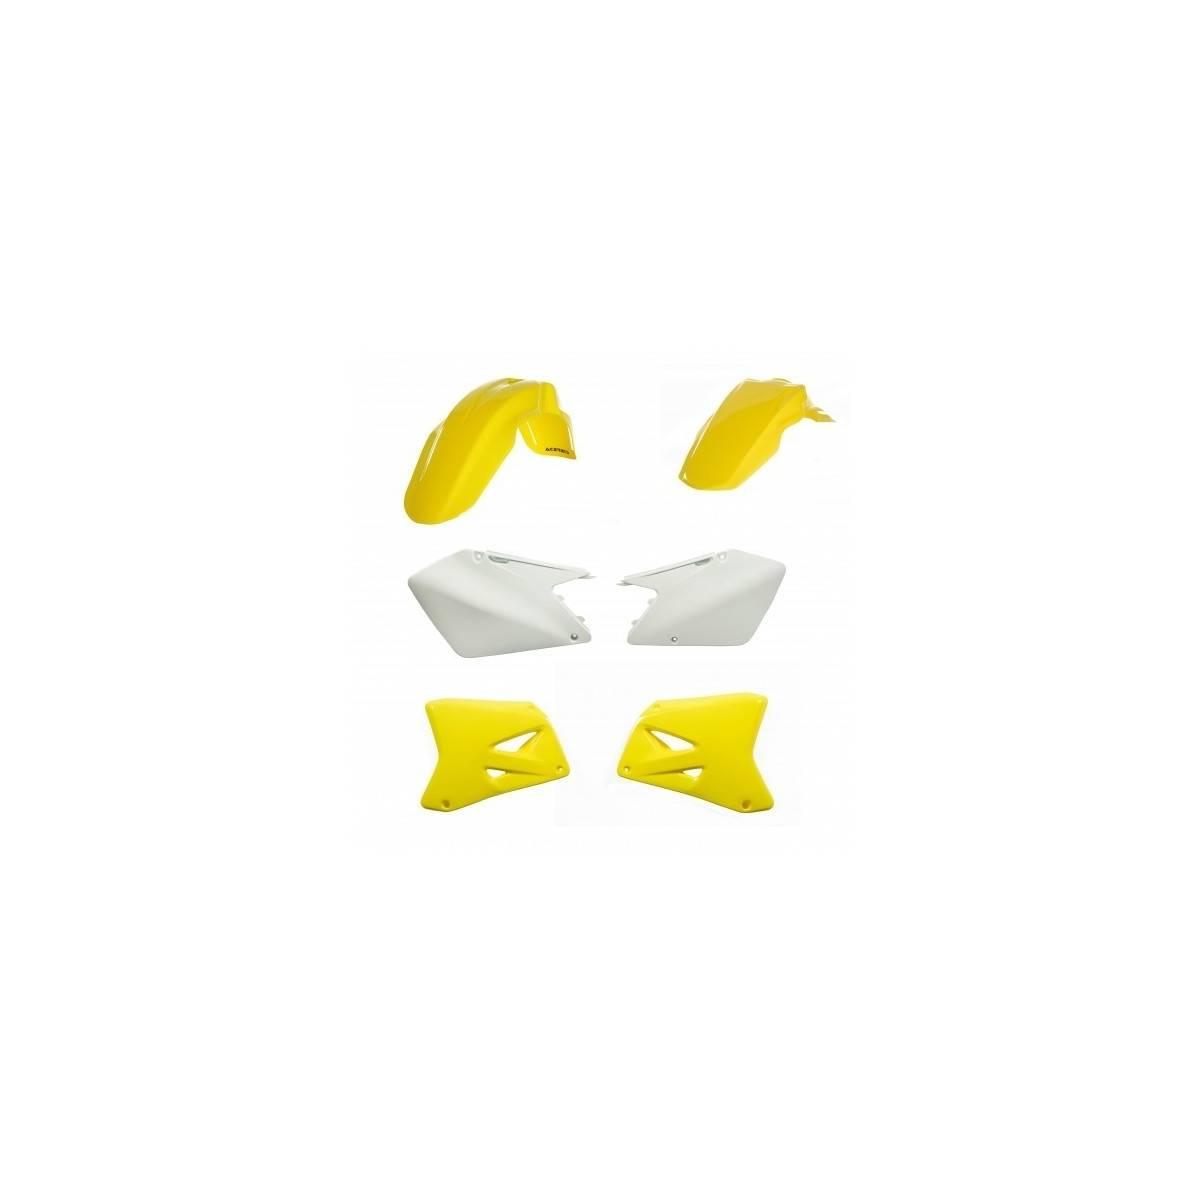 0023080-060 - Kit Plasticos Yzf 250 18 Amarillo